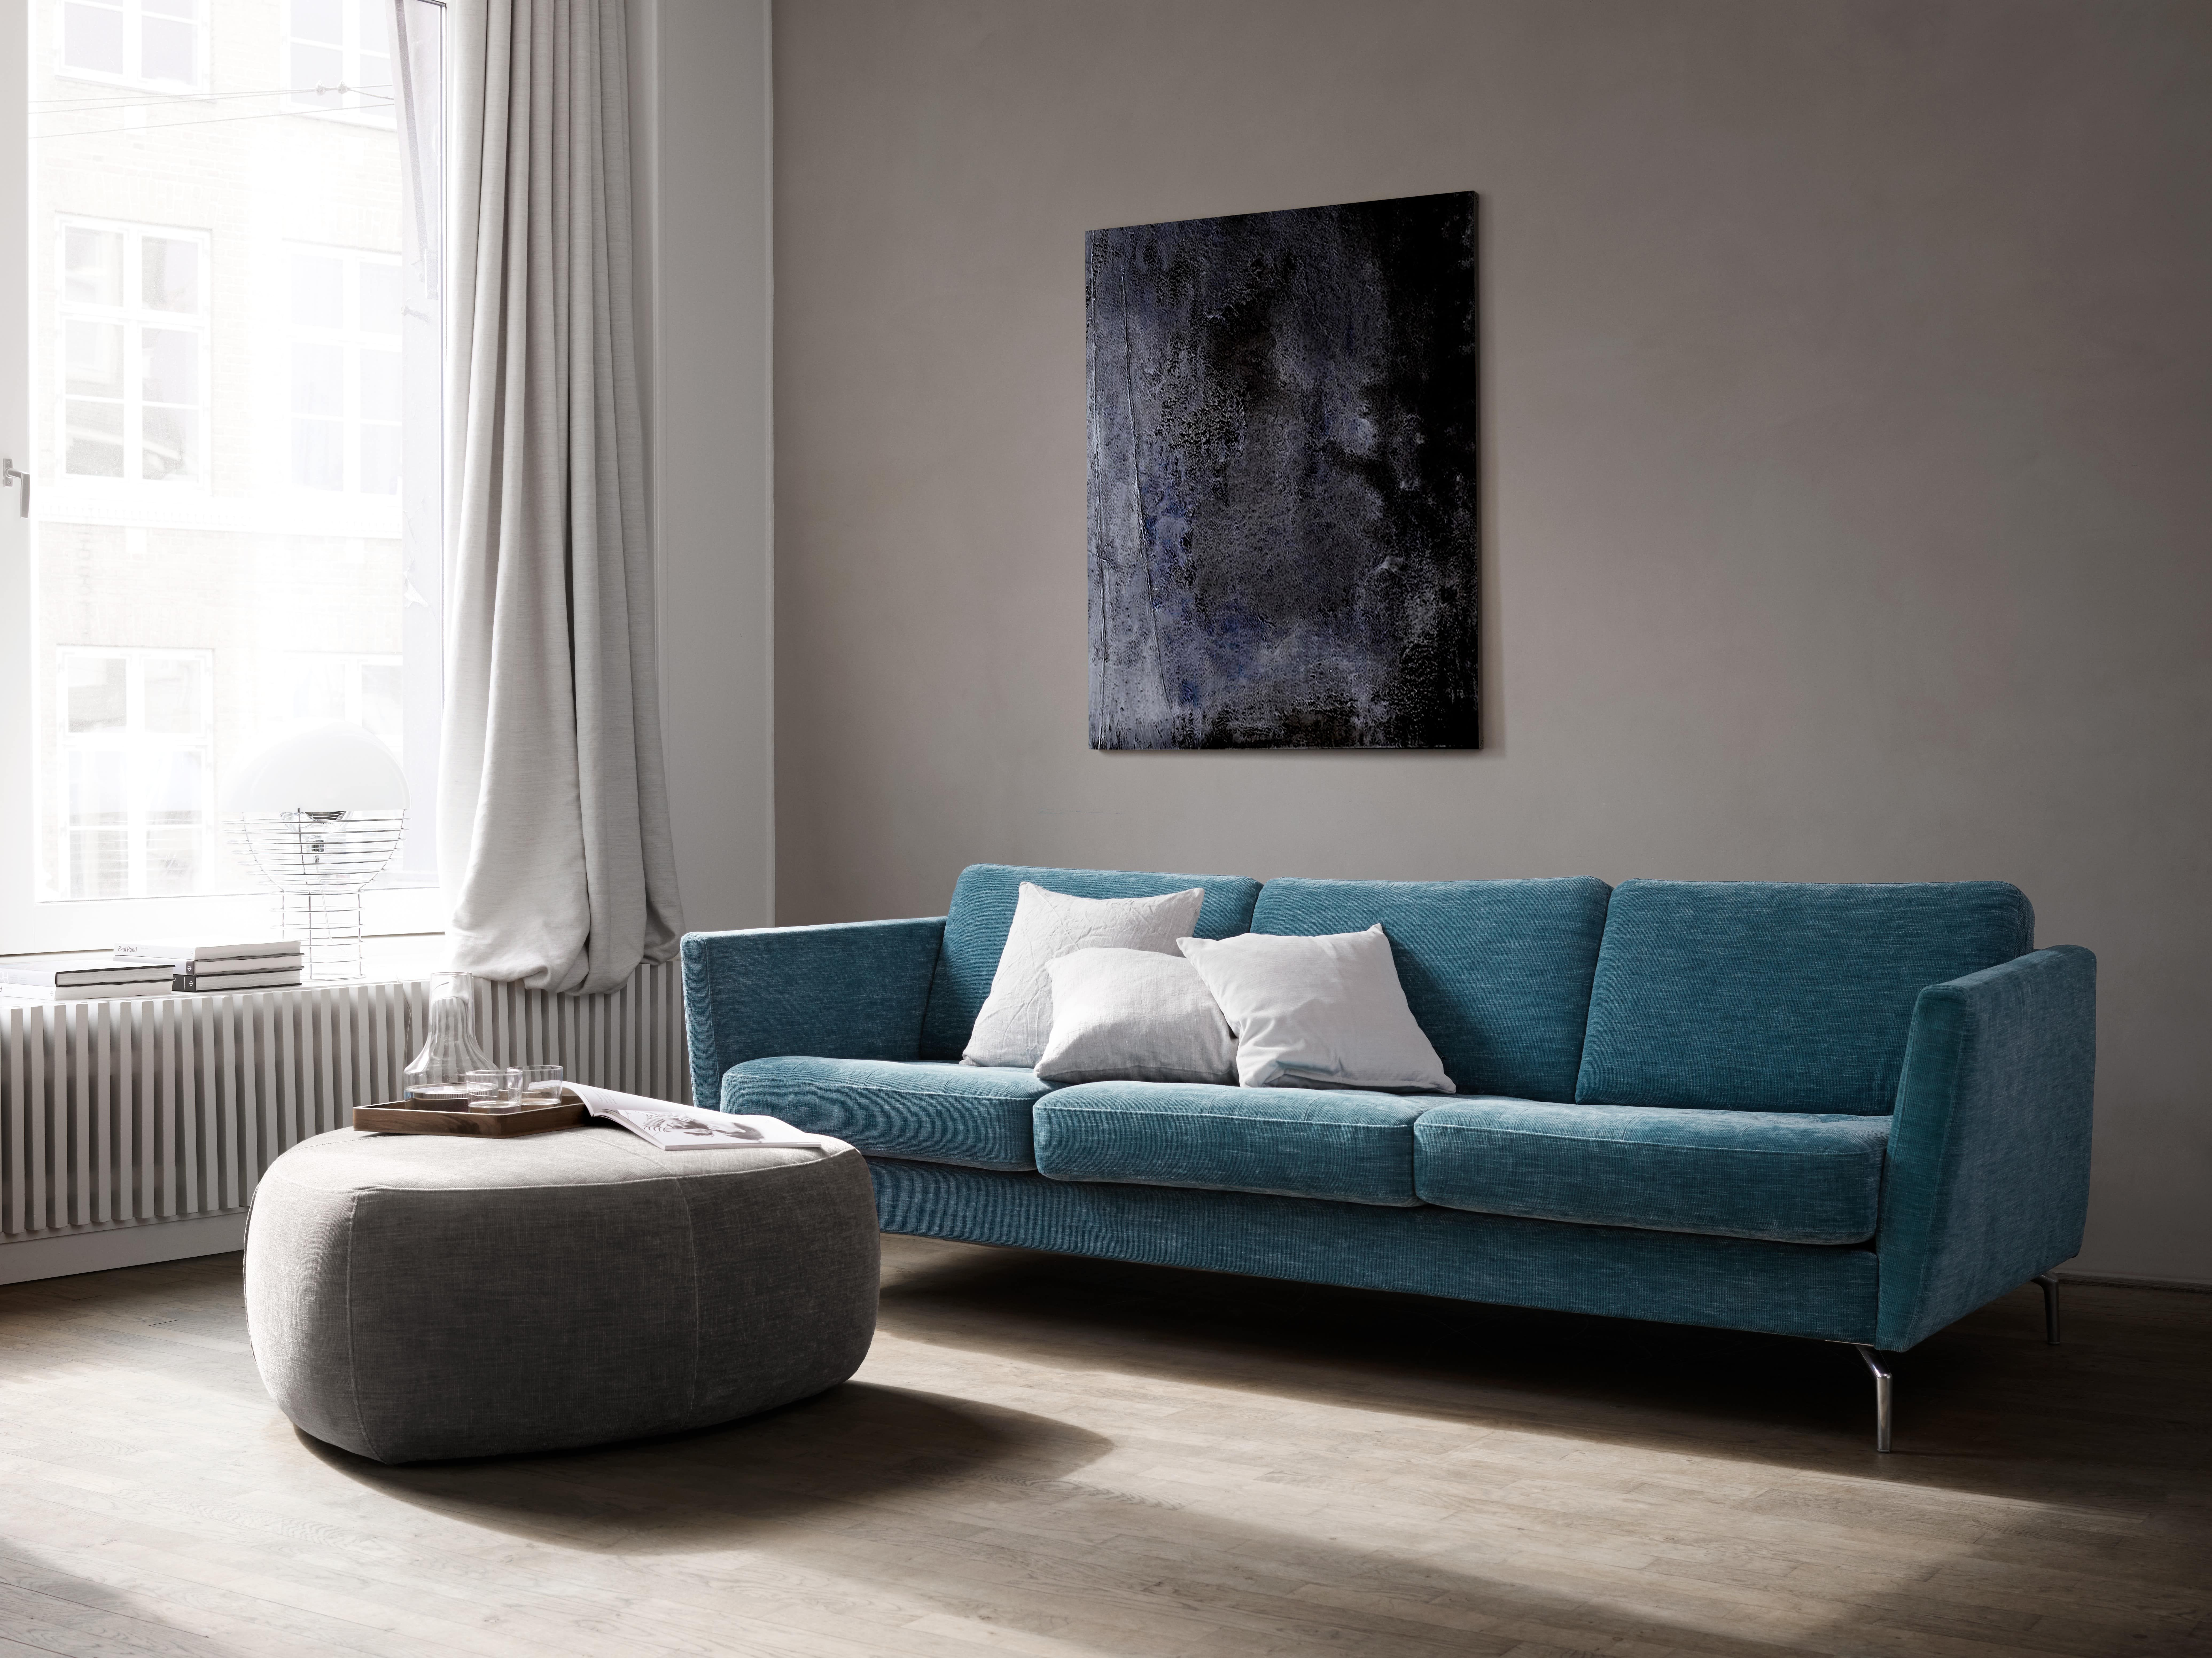 mut zur farbe unser osaka sofa in t rkis boconcept scandinaviandesign interiordesign. Black Bedroom Furniture Sets. Home Design Ideas